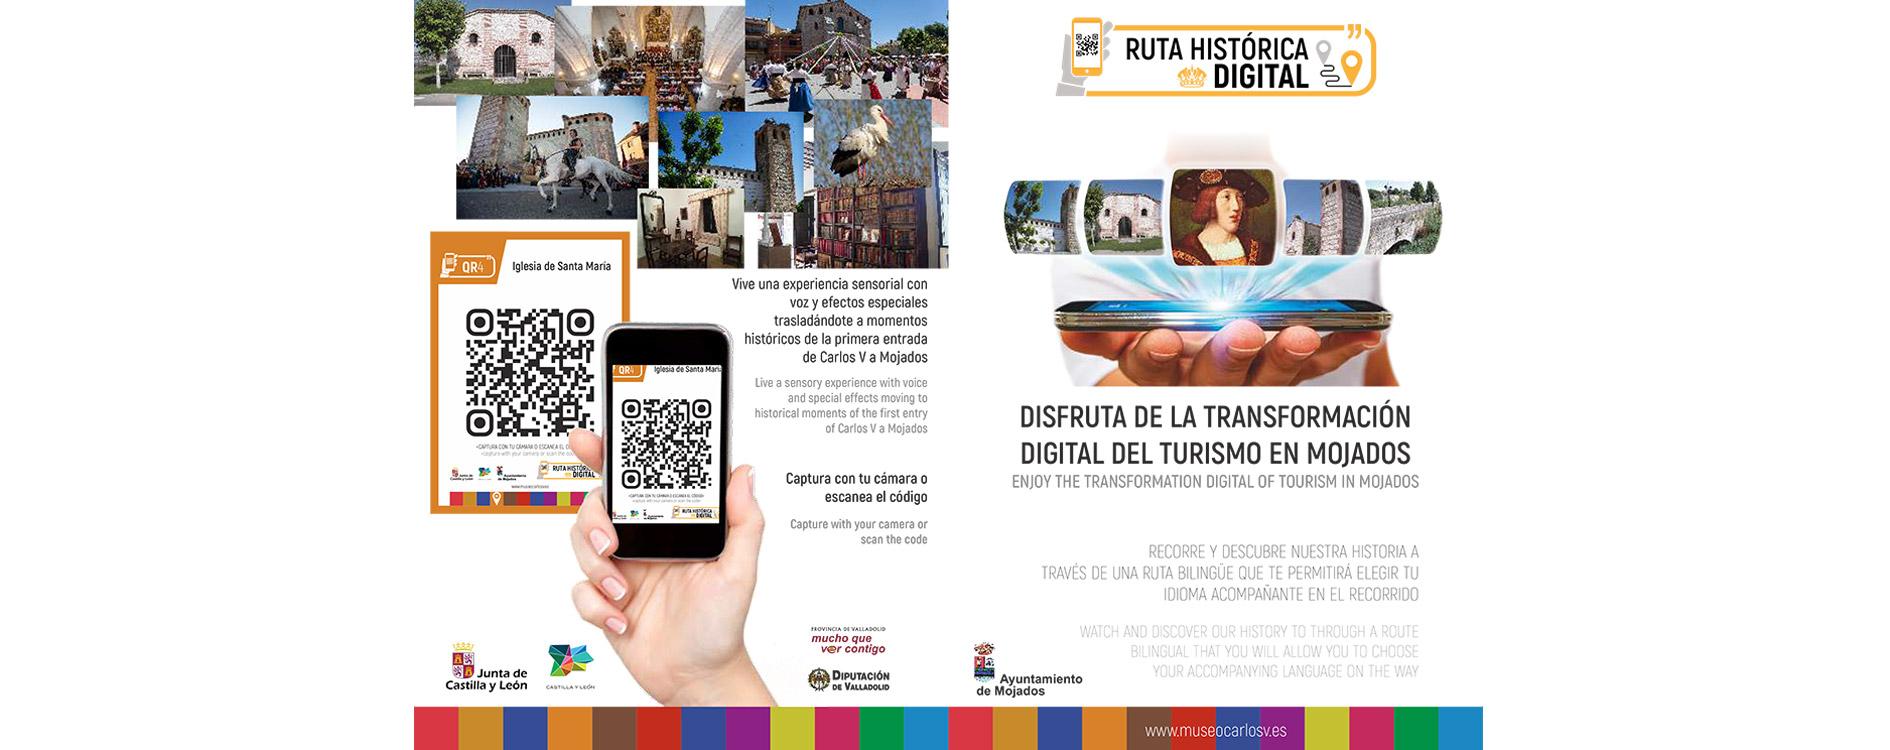 Ruta Histórica Digital Carlos V en Mojados